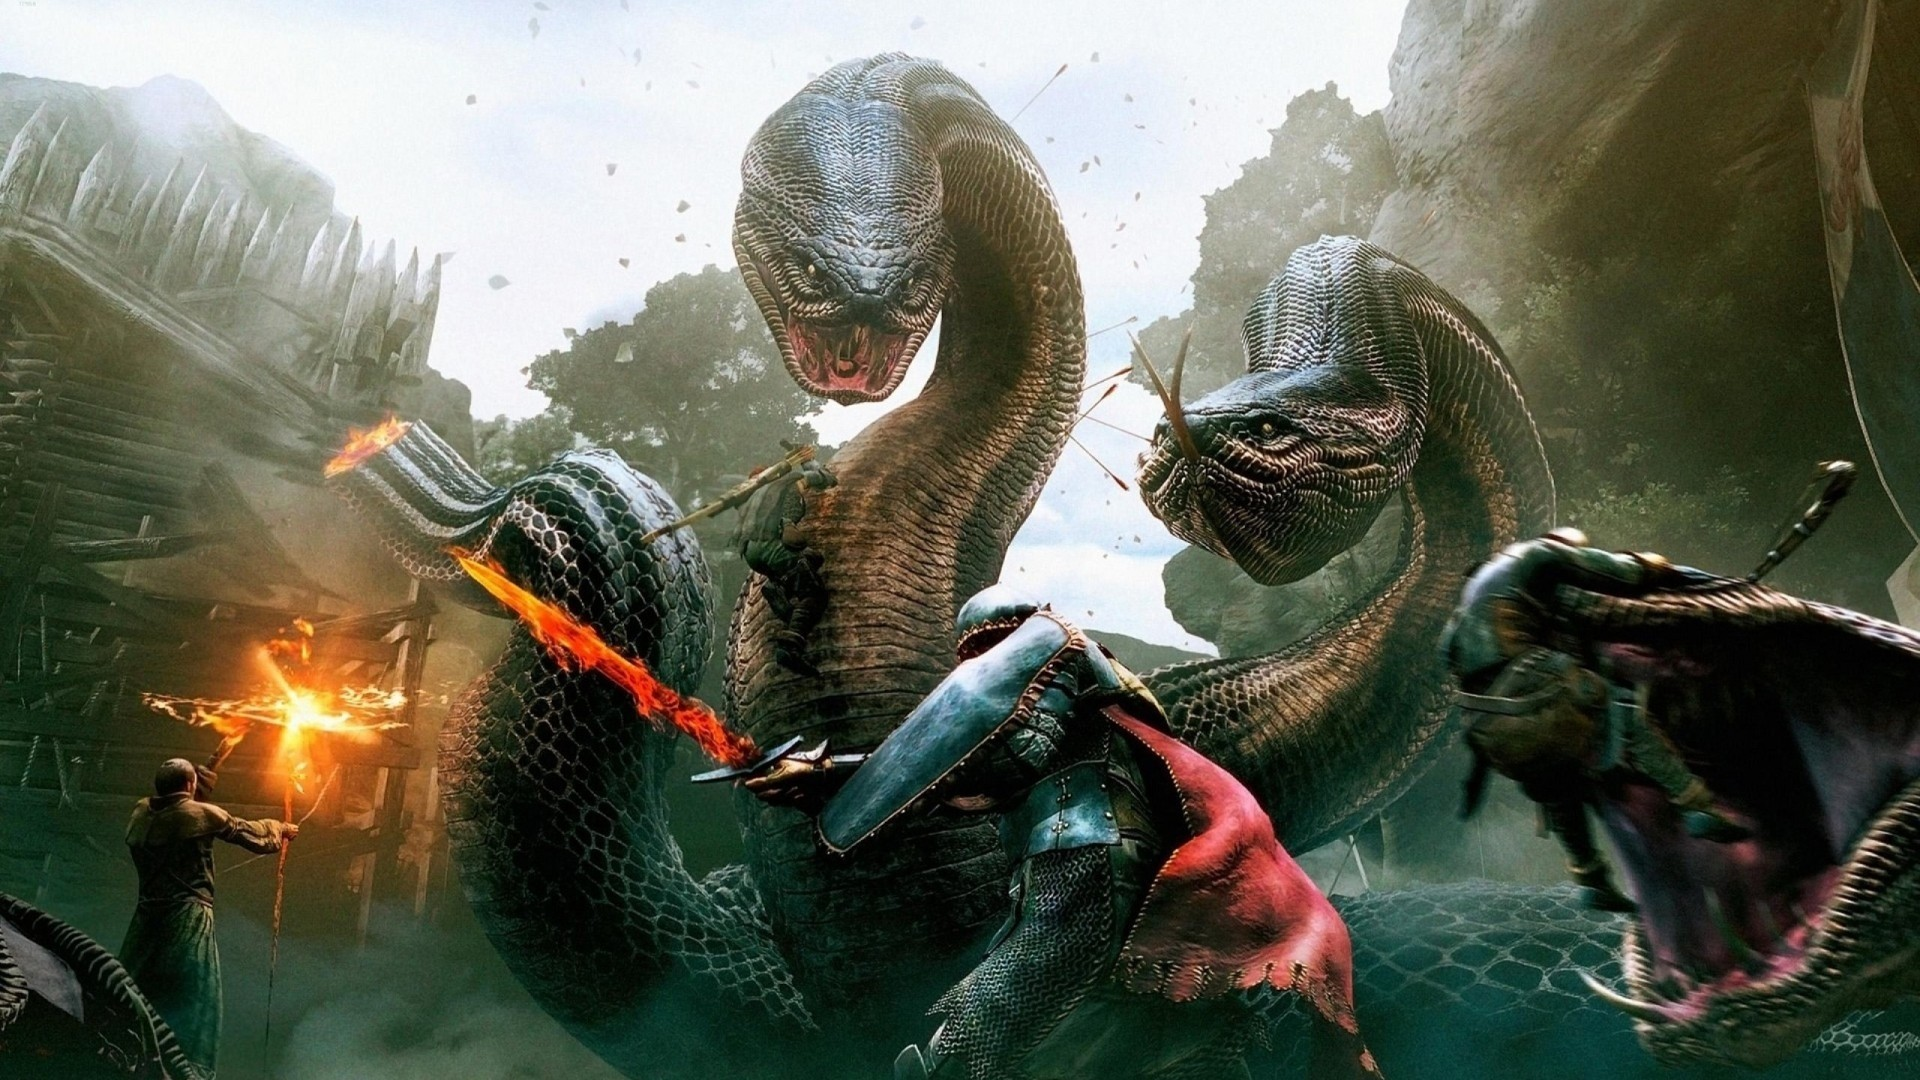 video games dragons fire hydra snakes giant fantasy art magic wizards  sorcerer artwork dragons dogma Art